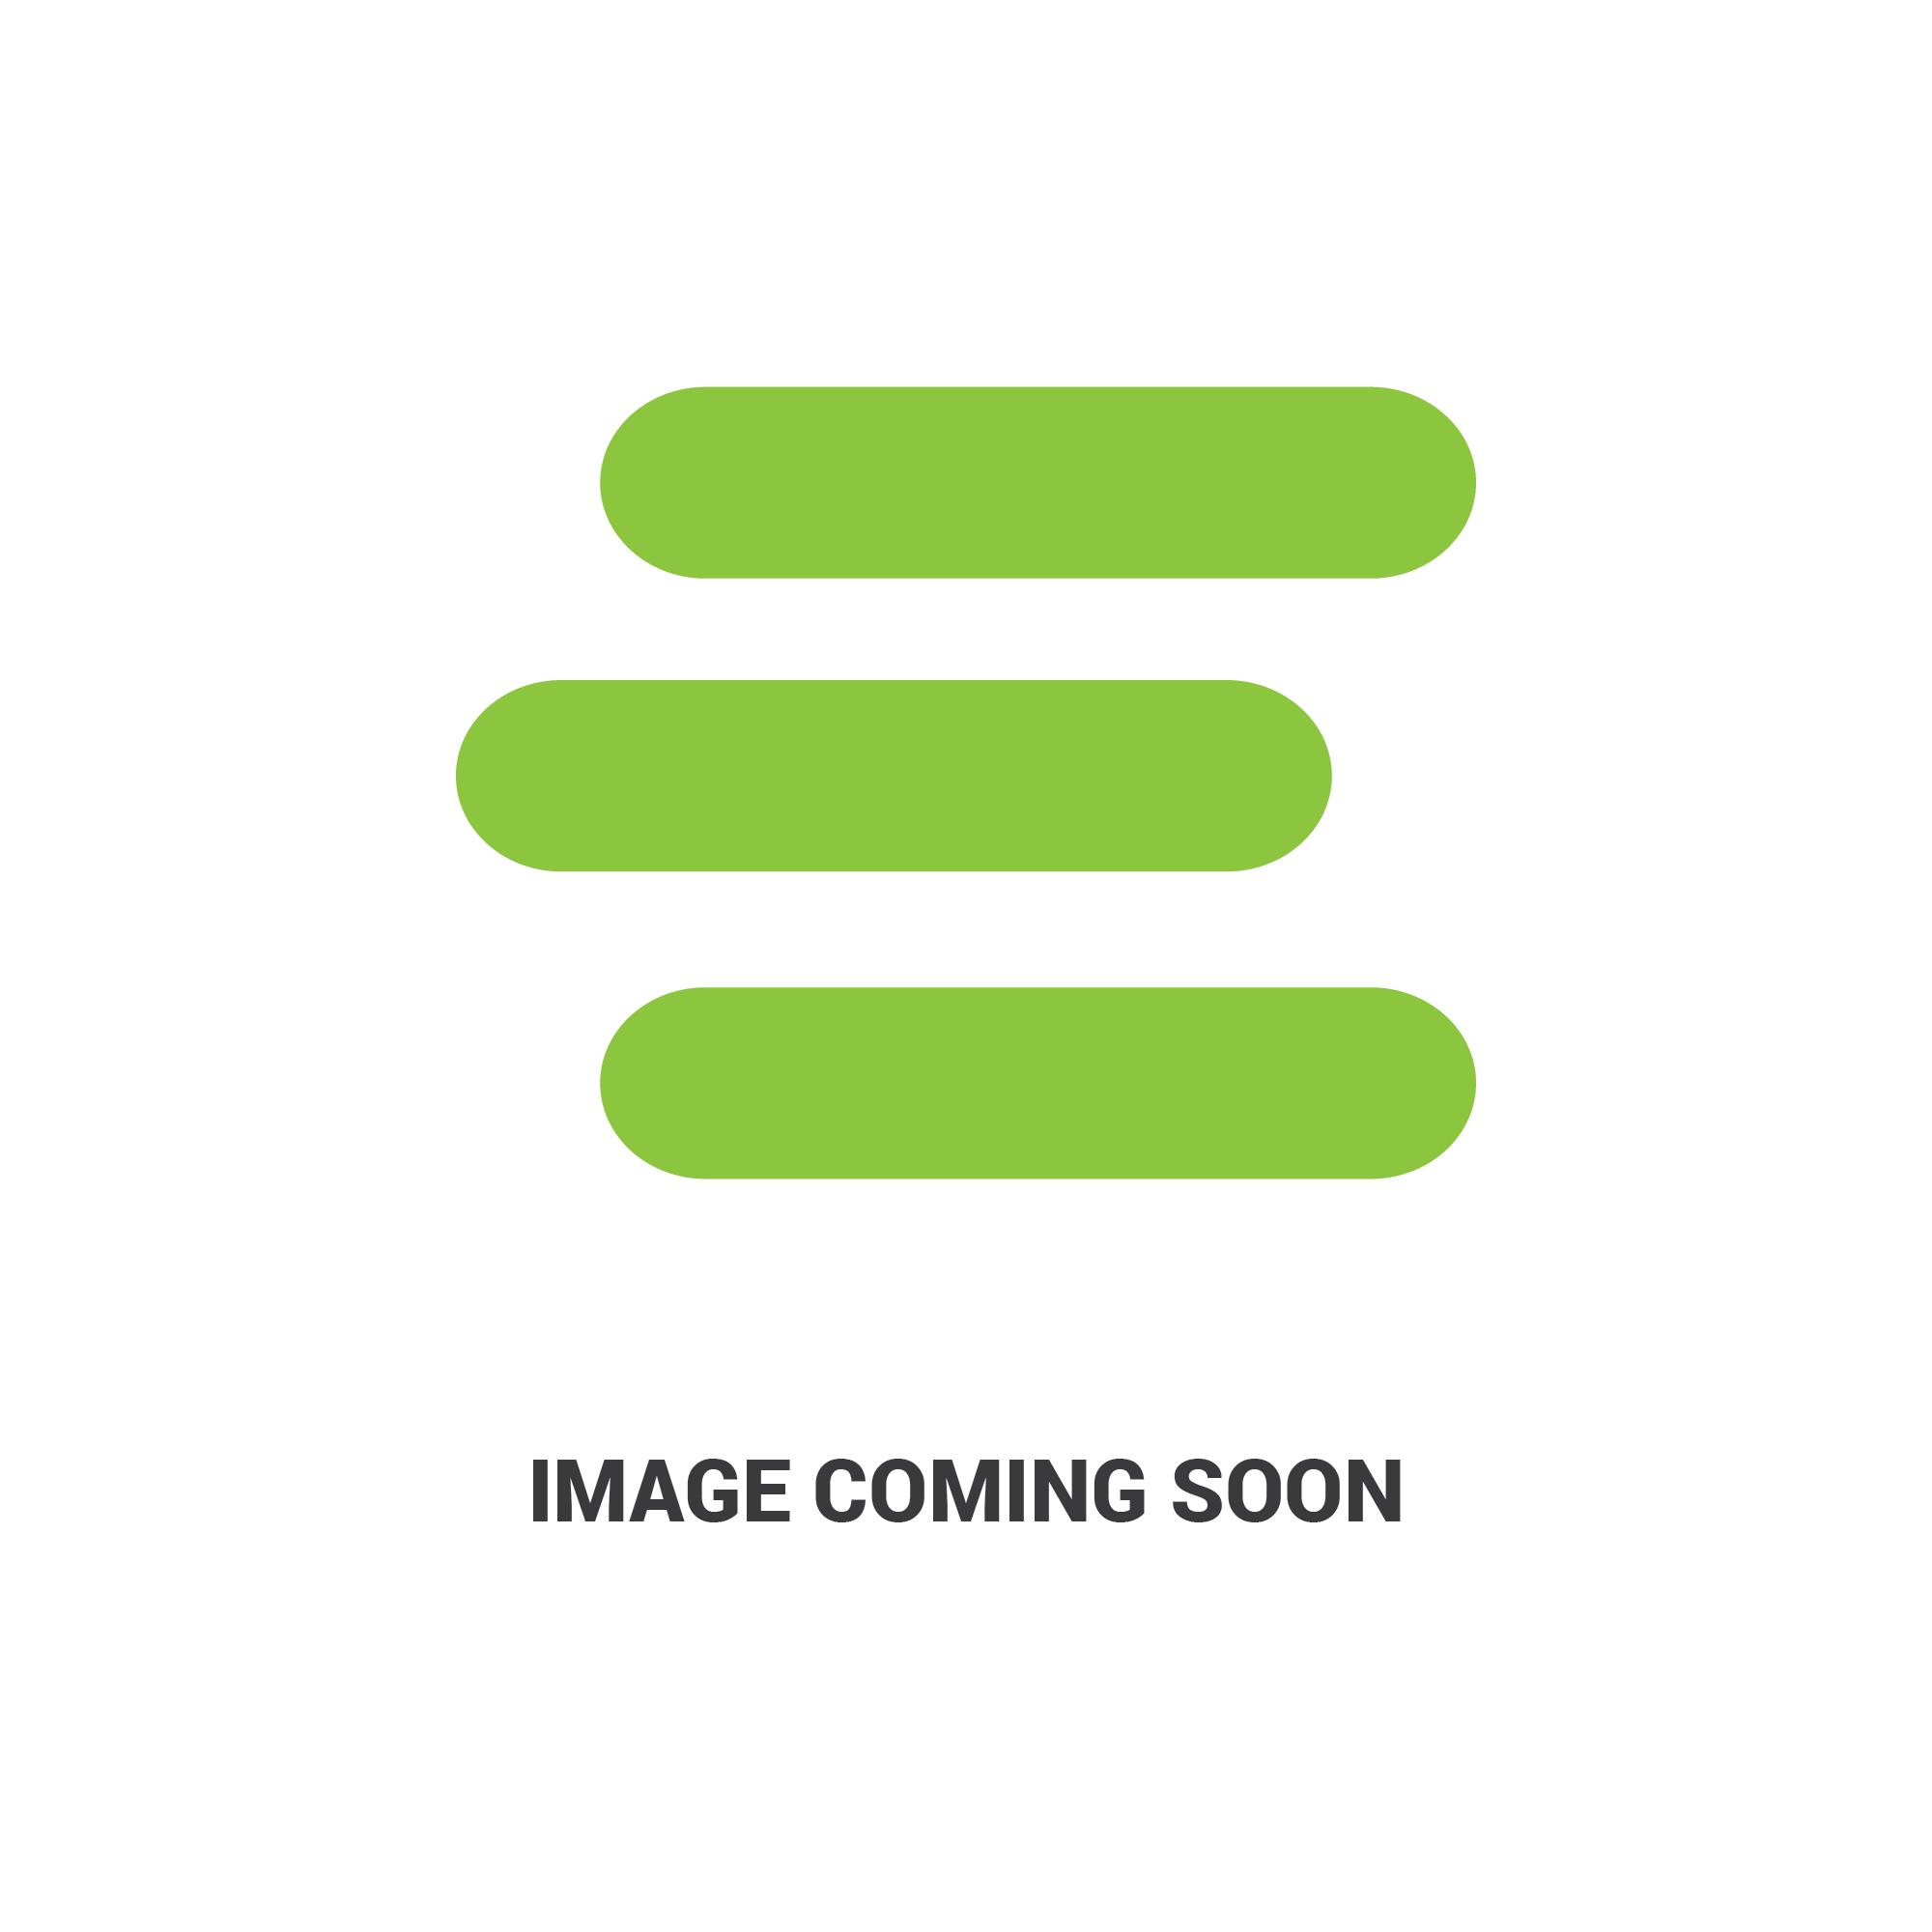 E-310030945_1.jpg